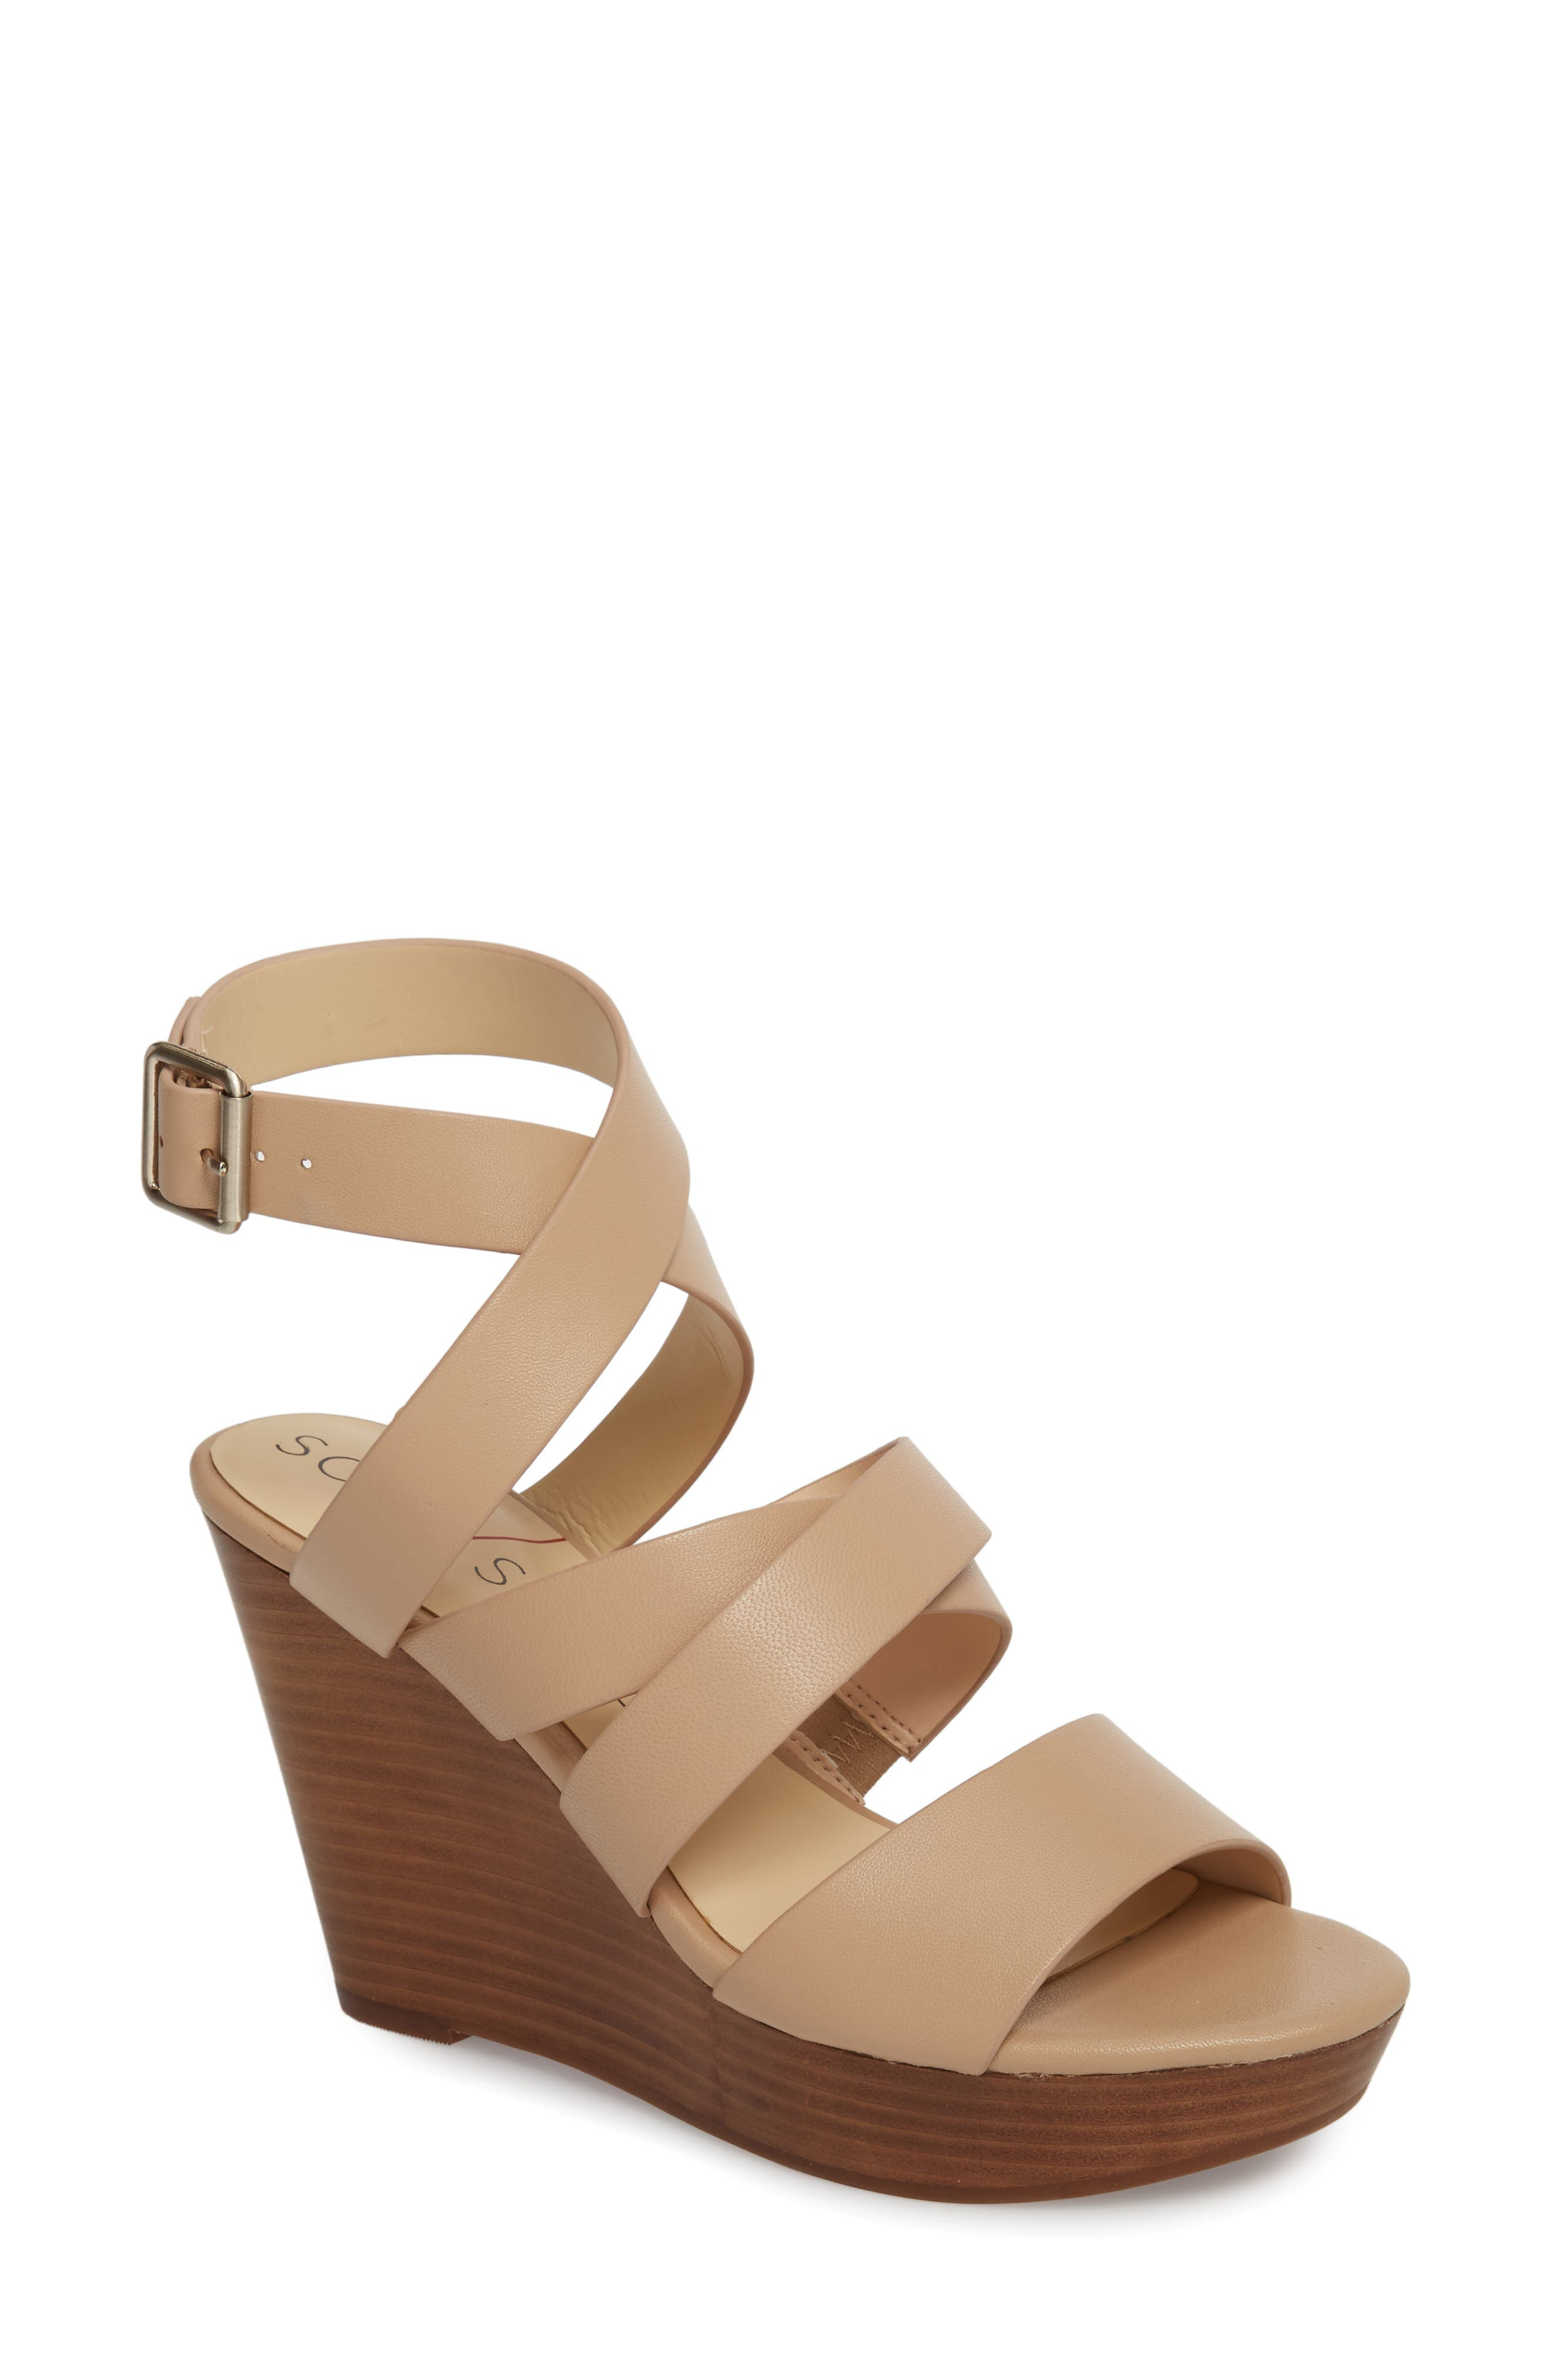 Sole Society Pippy Platform Sandal, Brown